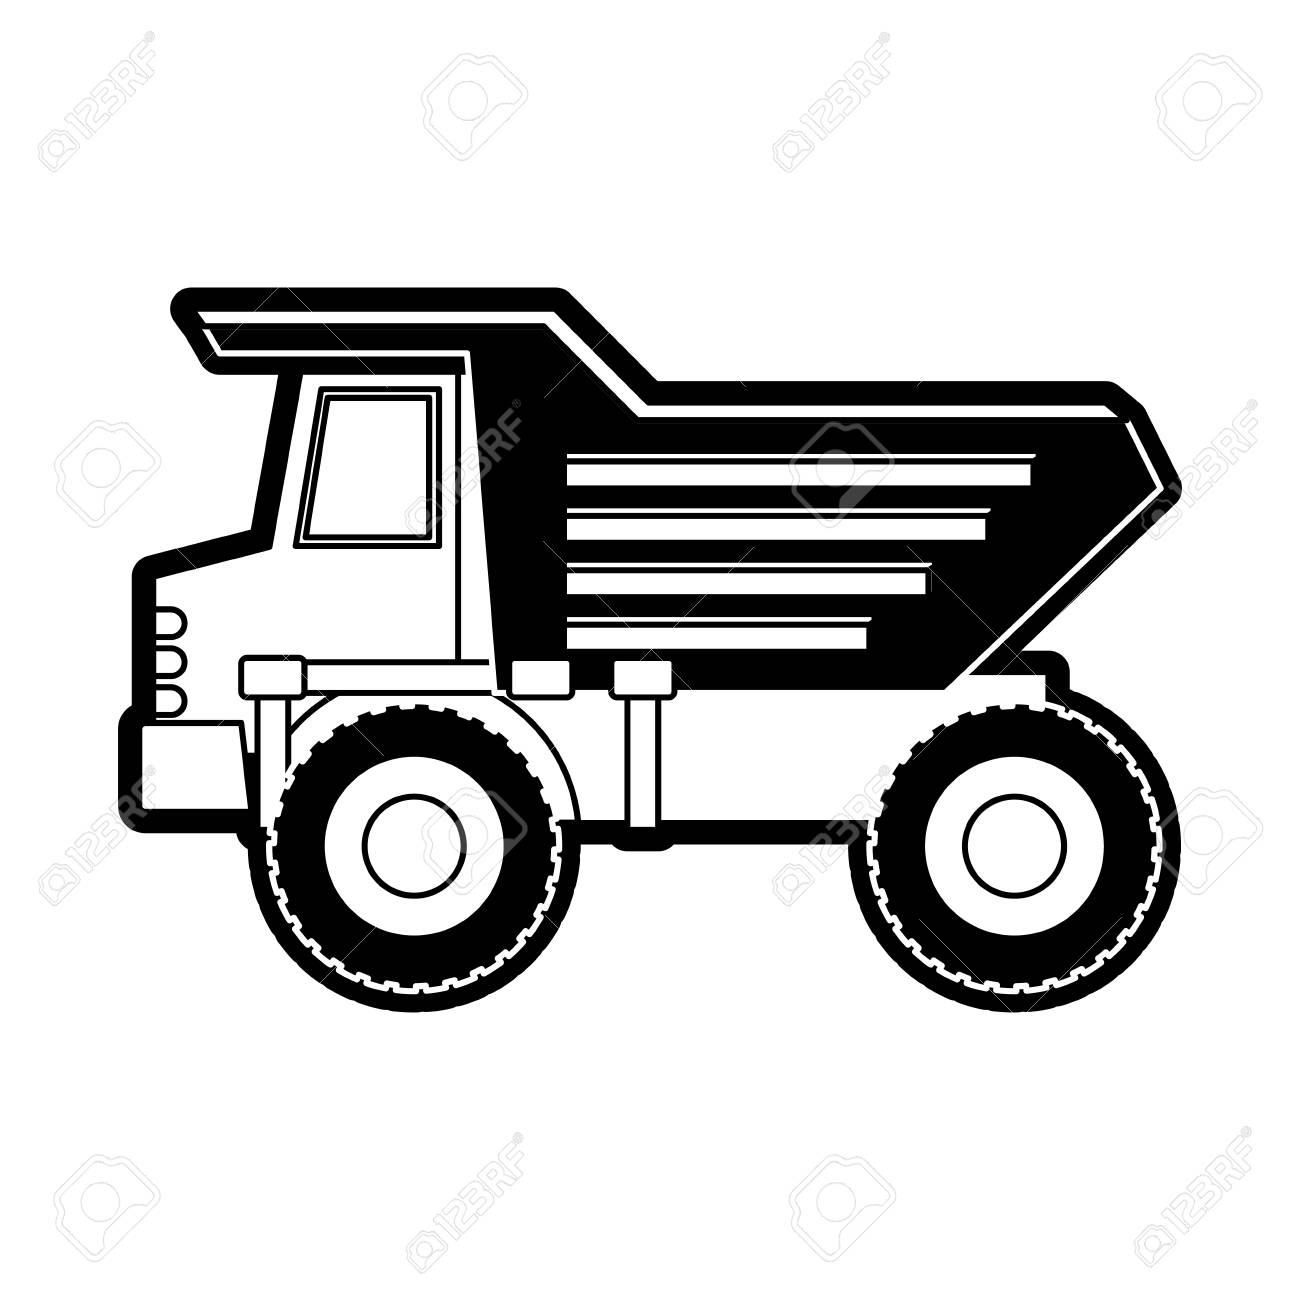 Dump truck flat icon black silhouette vector illustration..